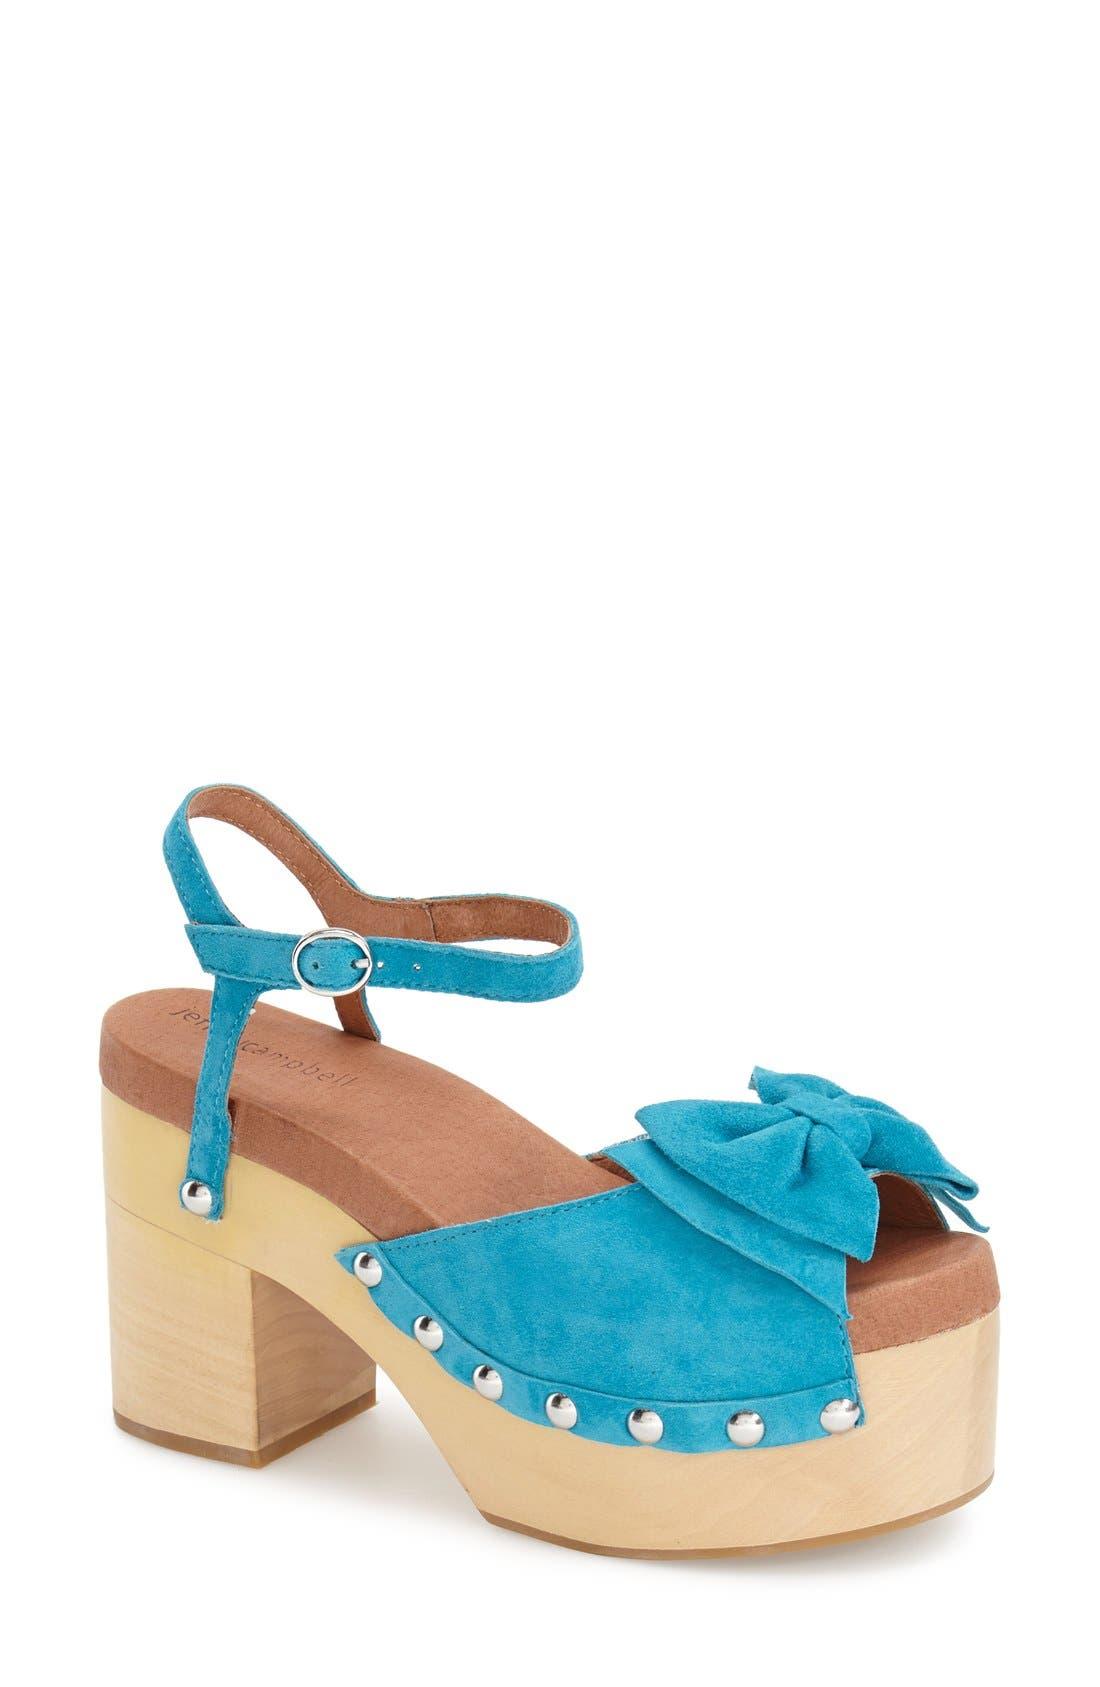 Alternate Image 1 Selected - Jeffrey Campbell 'Bridget' Platform Sandal (Women)